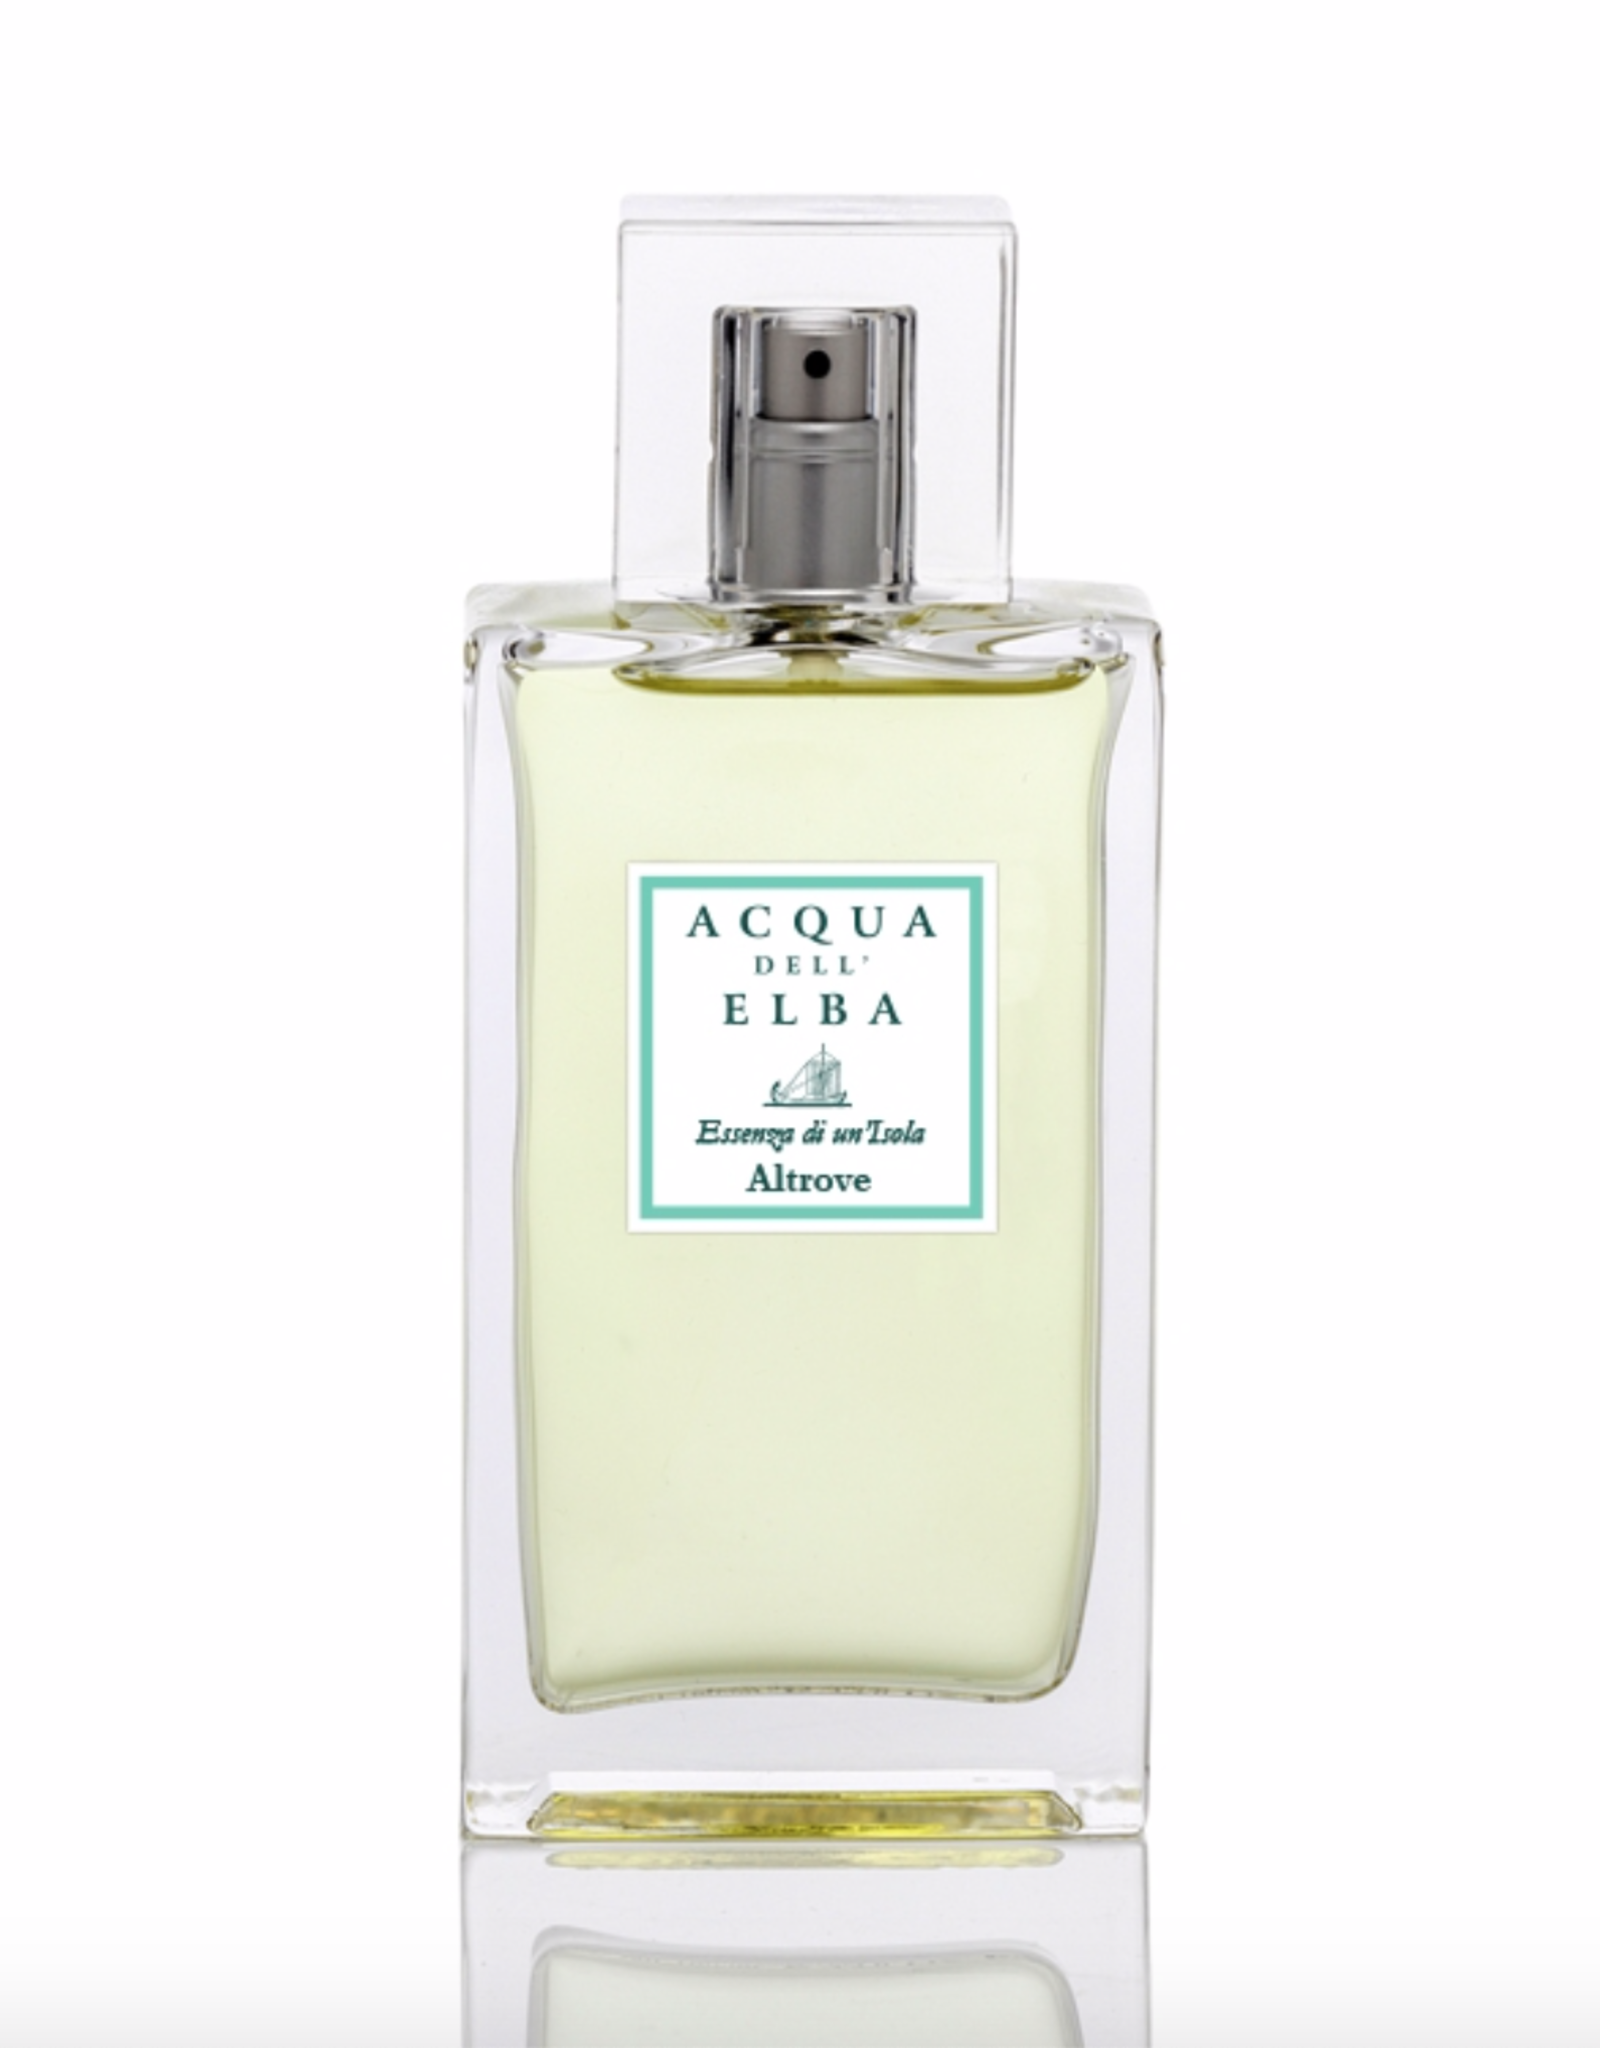 Acqua Dell Elba Acqua Dell' Elba Altrove Eau de Parfum 50ML